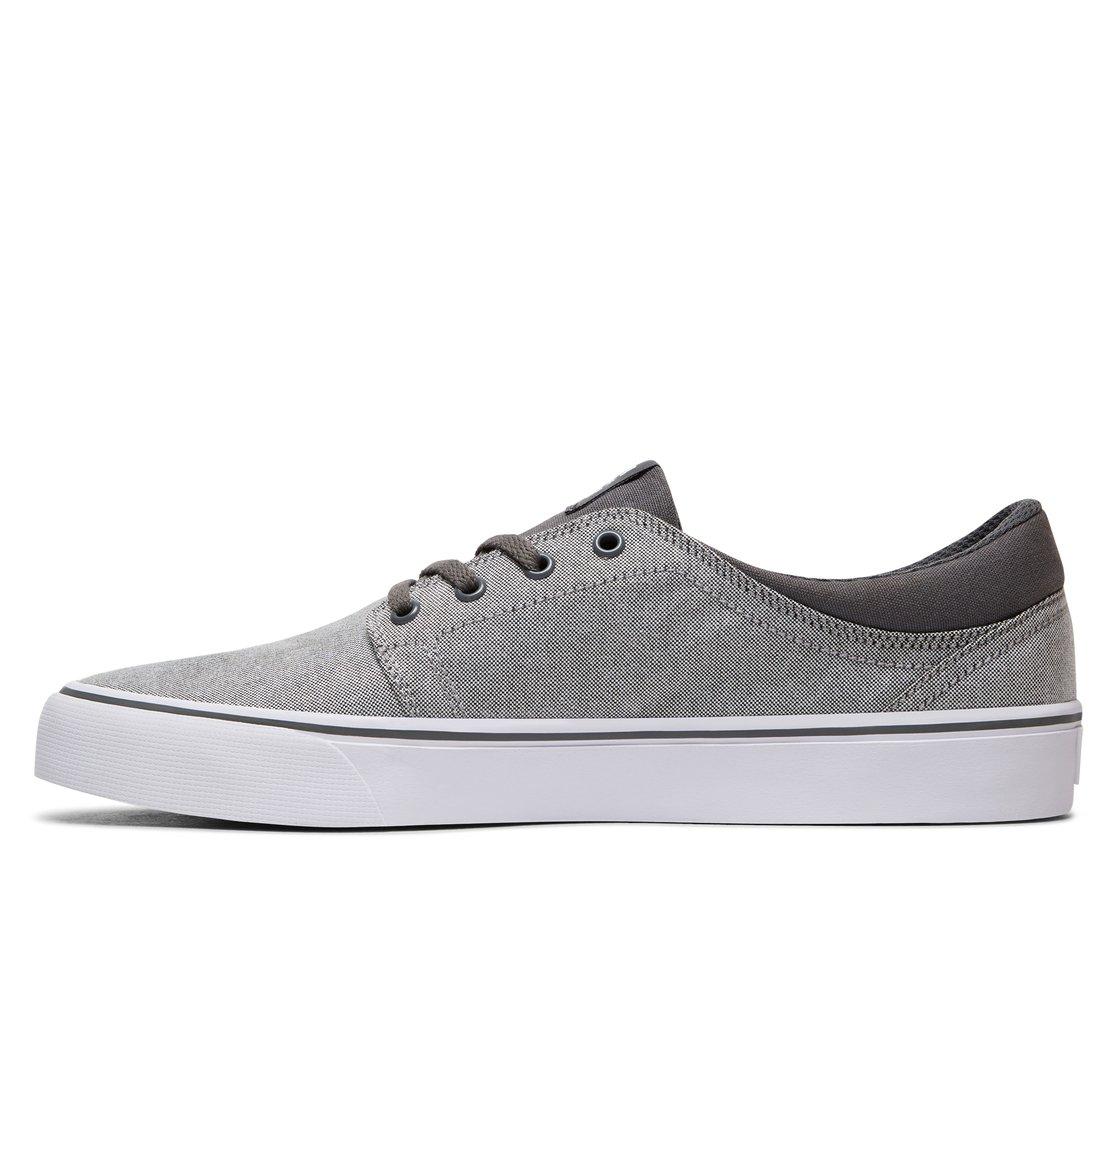 DC Shoes Trase TX SE - Shoes - Zapatos - Hombre - 12.5